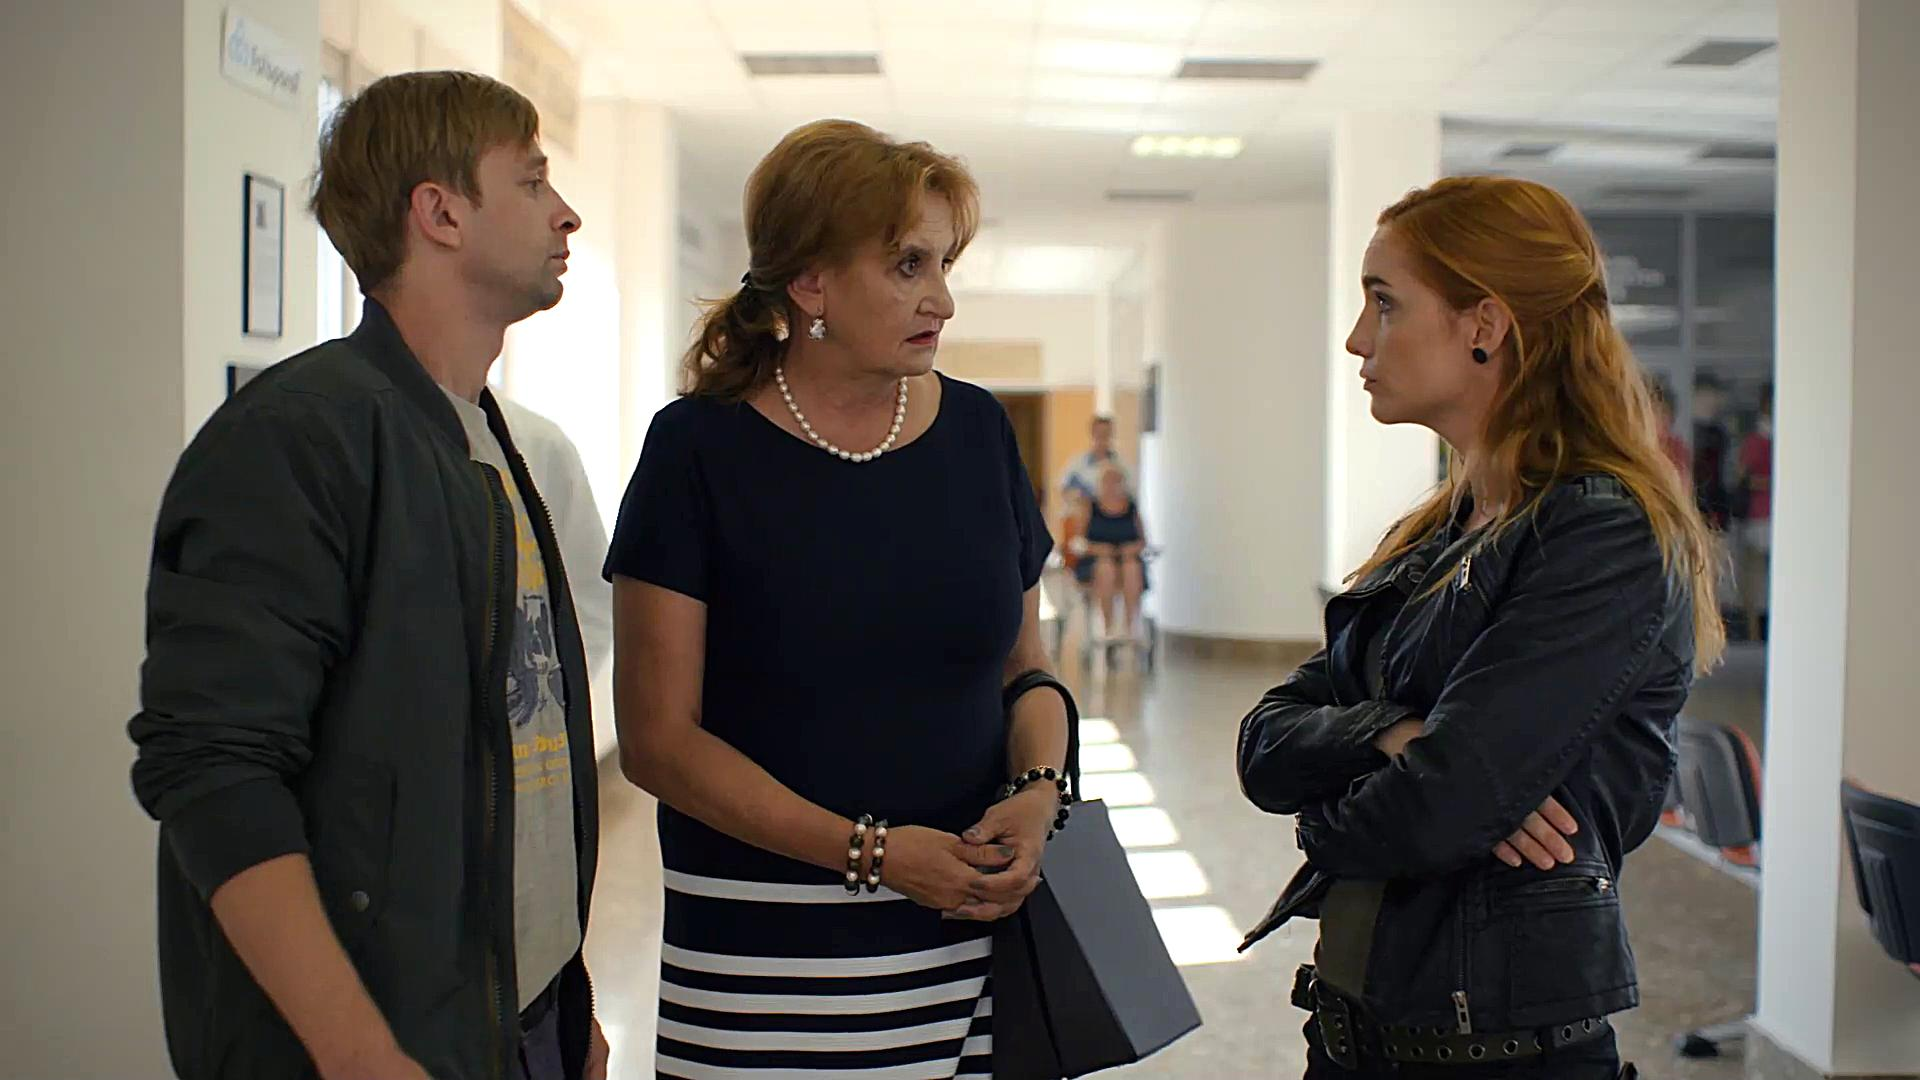 Eva Holubová, Hana Vagnerová, and Lukás Príkazský in Prípad mrtvého neboztíka (2020)